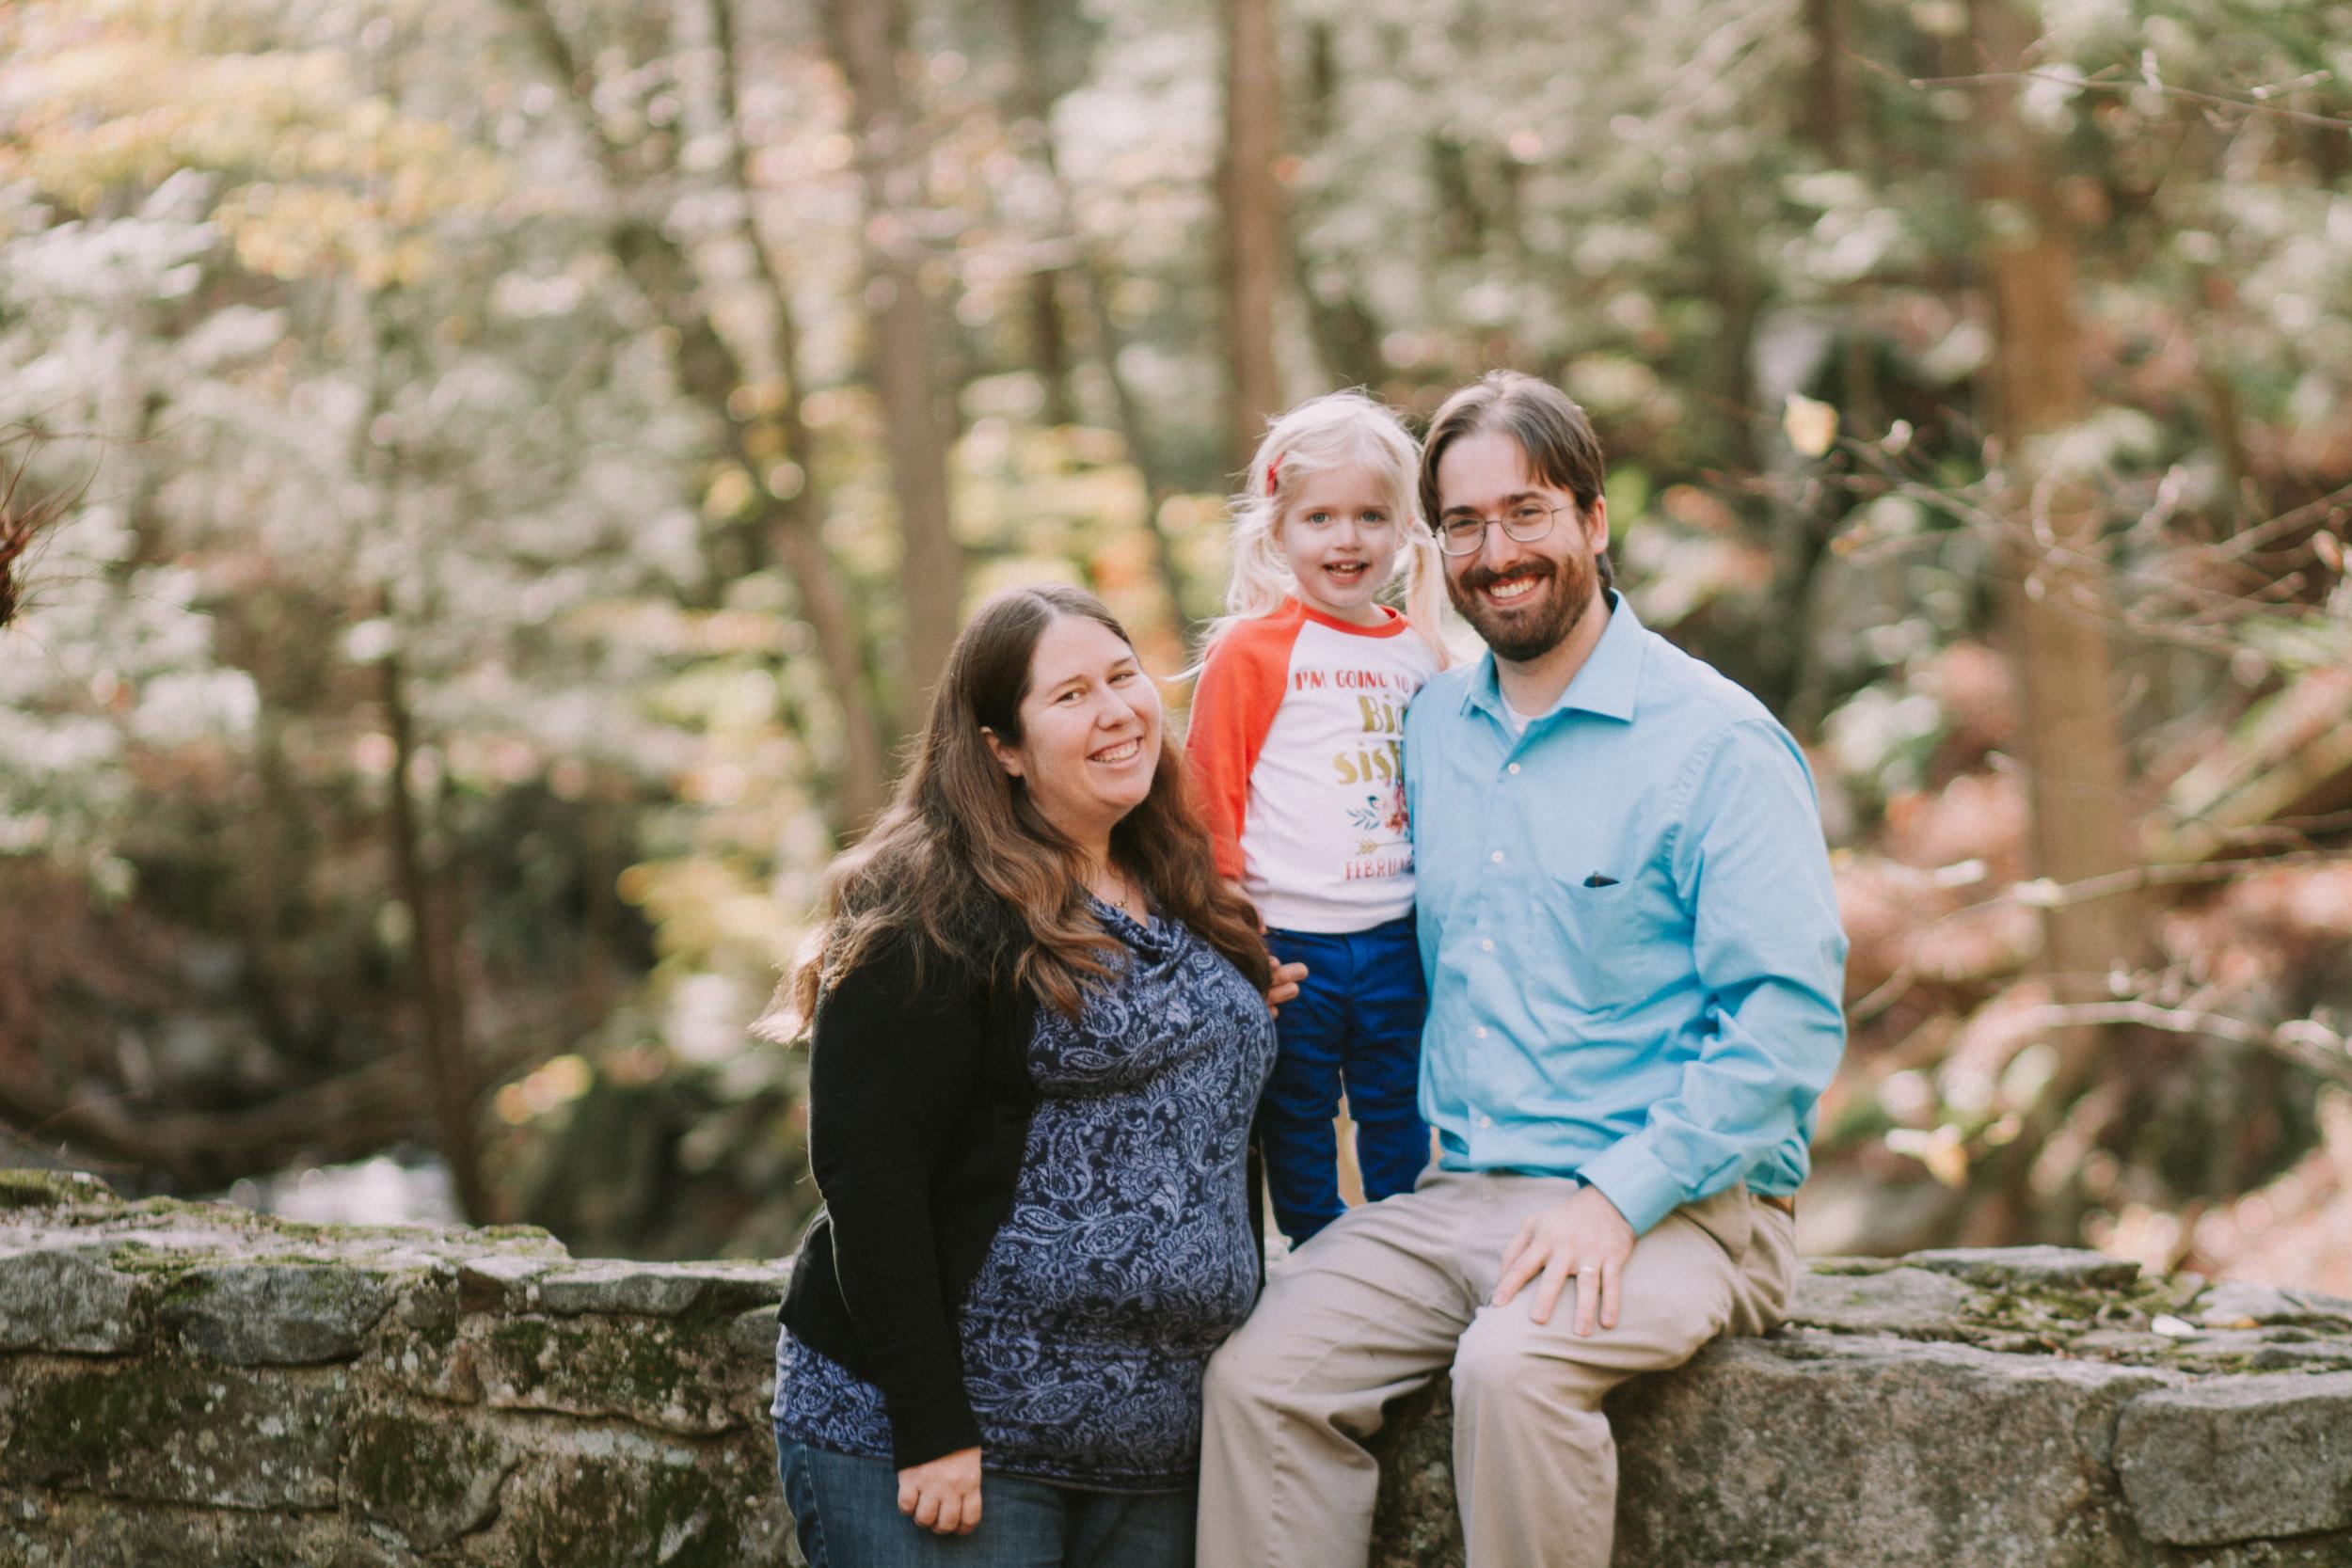 Connecticut Family Photographer, Southbury Connecticut, Shannon Sorensen Photography, Massachusetts Family Photographer, New England Family Photographer